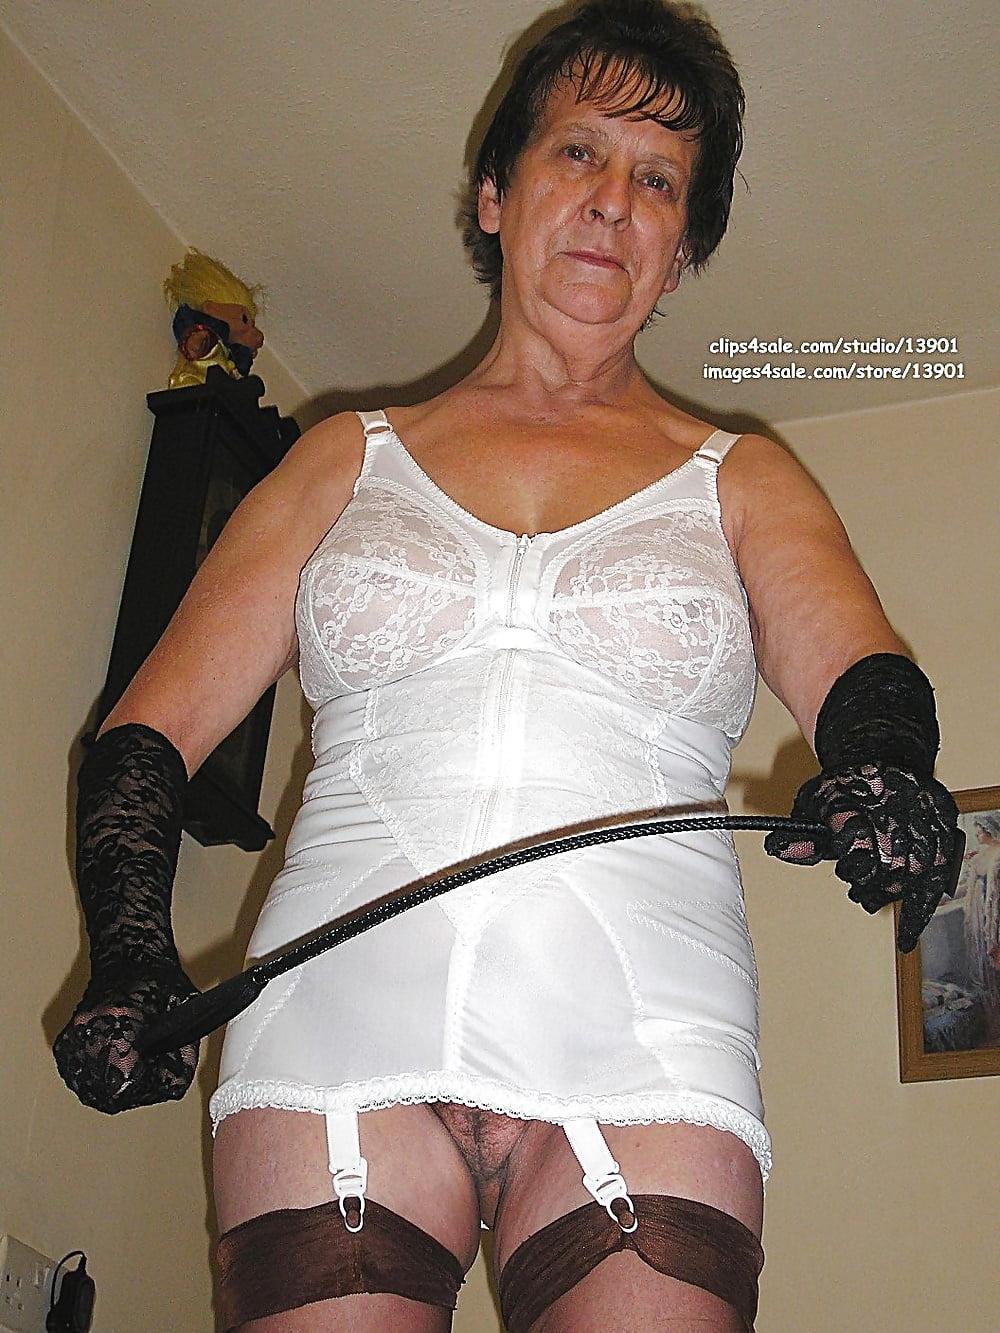 girdle-video-granny-mature